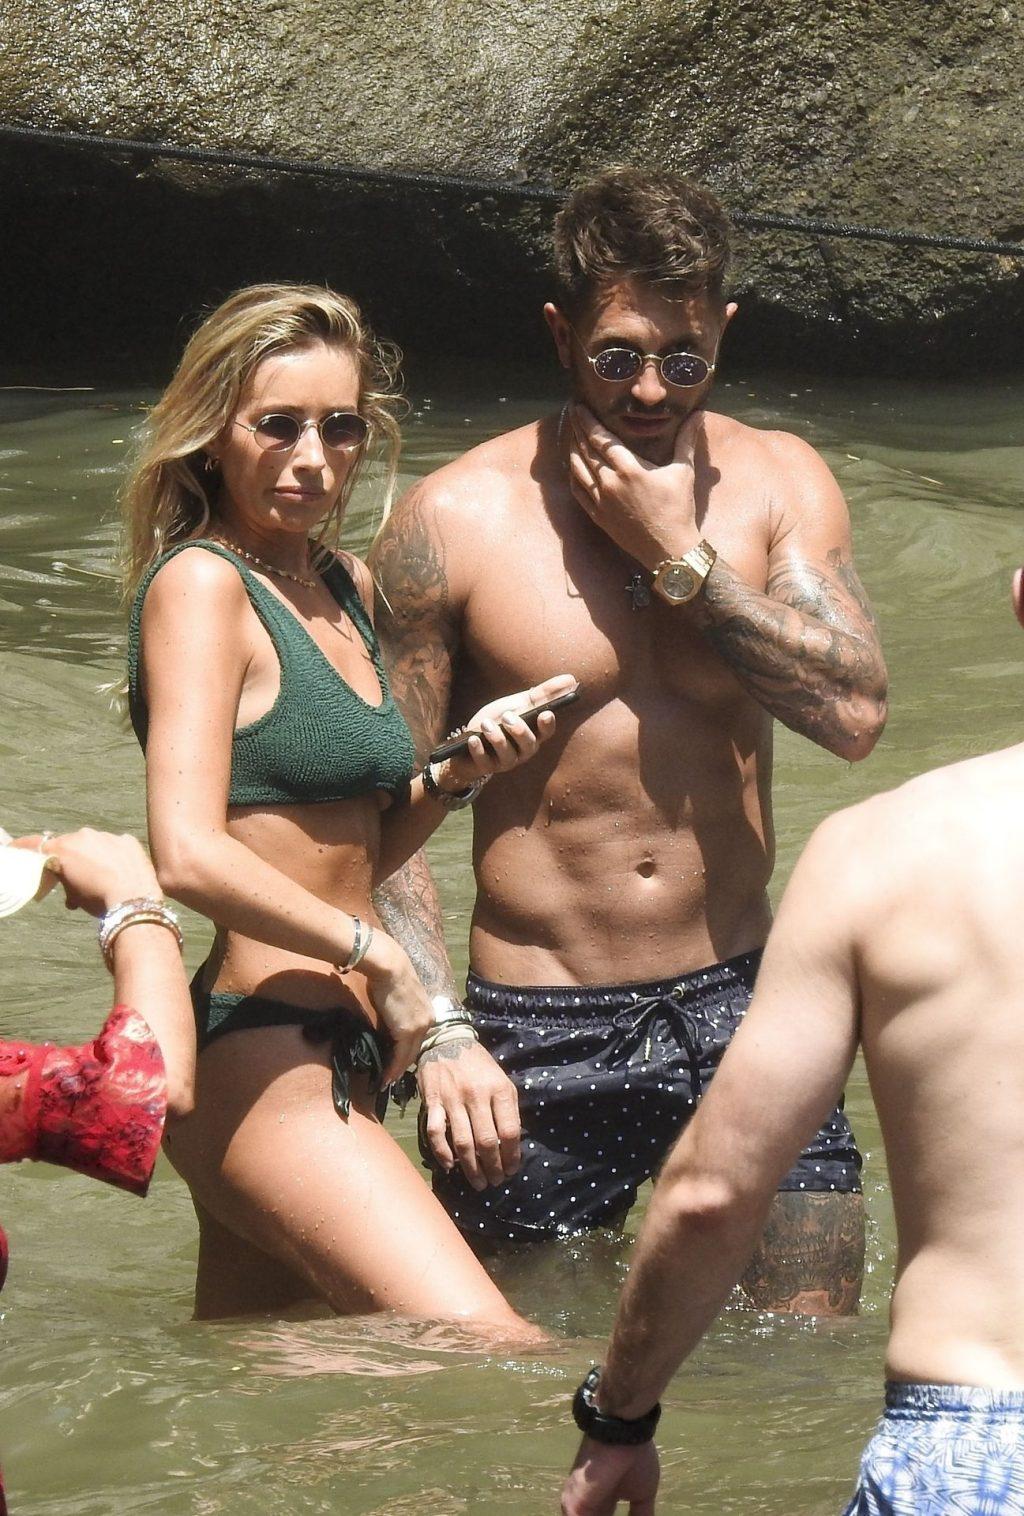 Anastasija Budic naked pics. 2018-2019 celebrityes photos leaks! nude (26 pic)